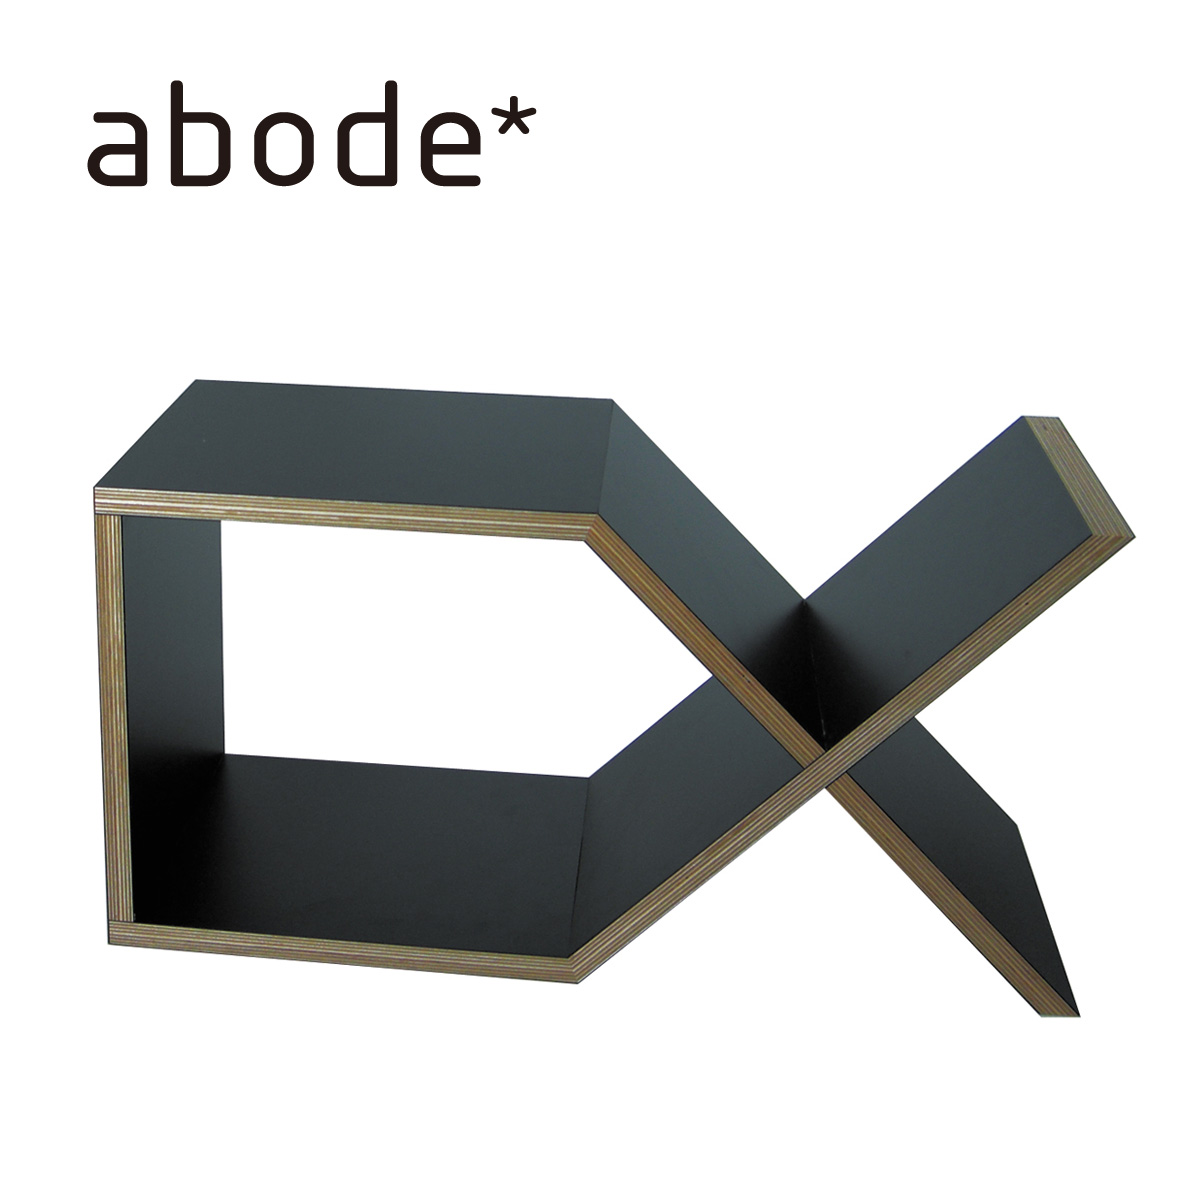 abode アボード 家具 ディーエックス DX ブラック 津留 敬文 サイドテーブル・ブックシェルフ・収納・組立収納デザイナーズ家具